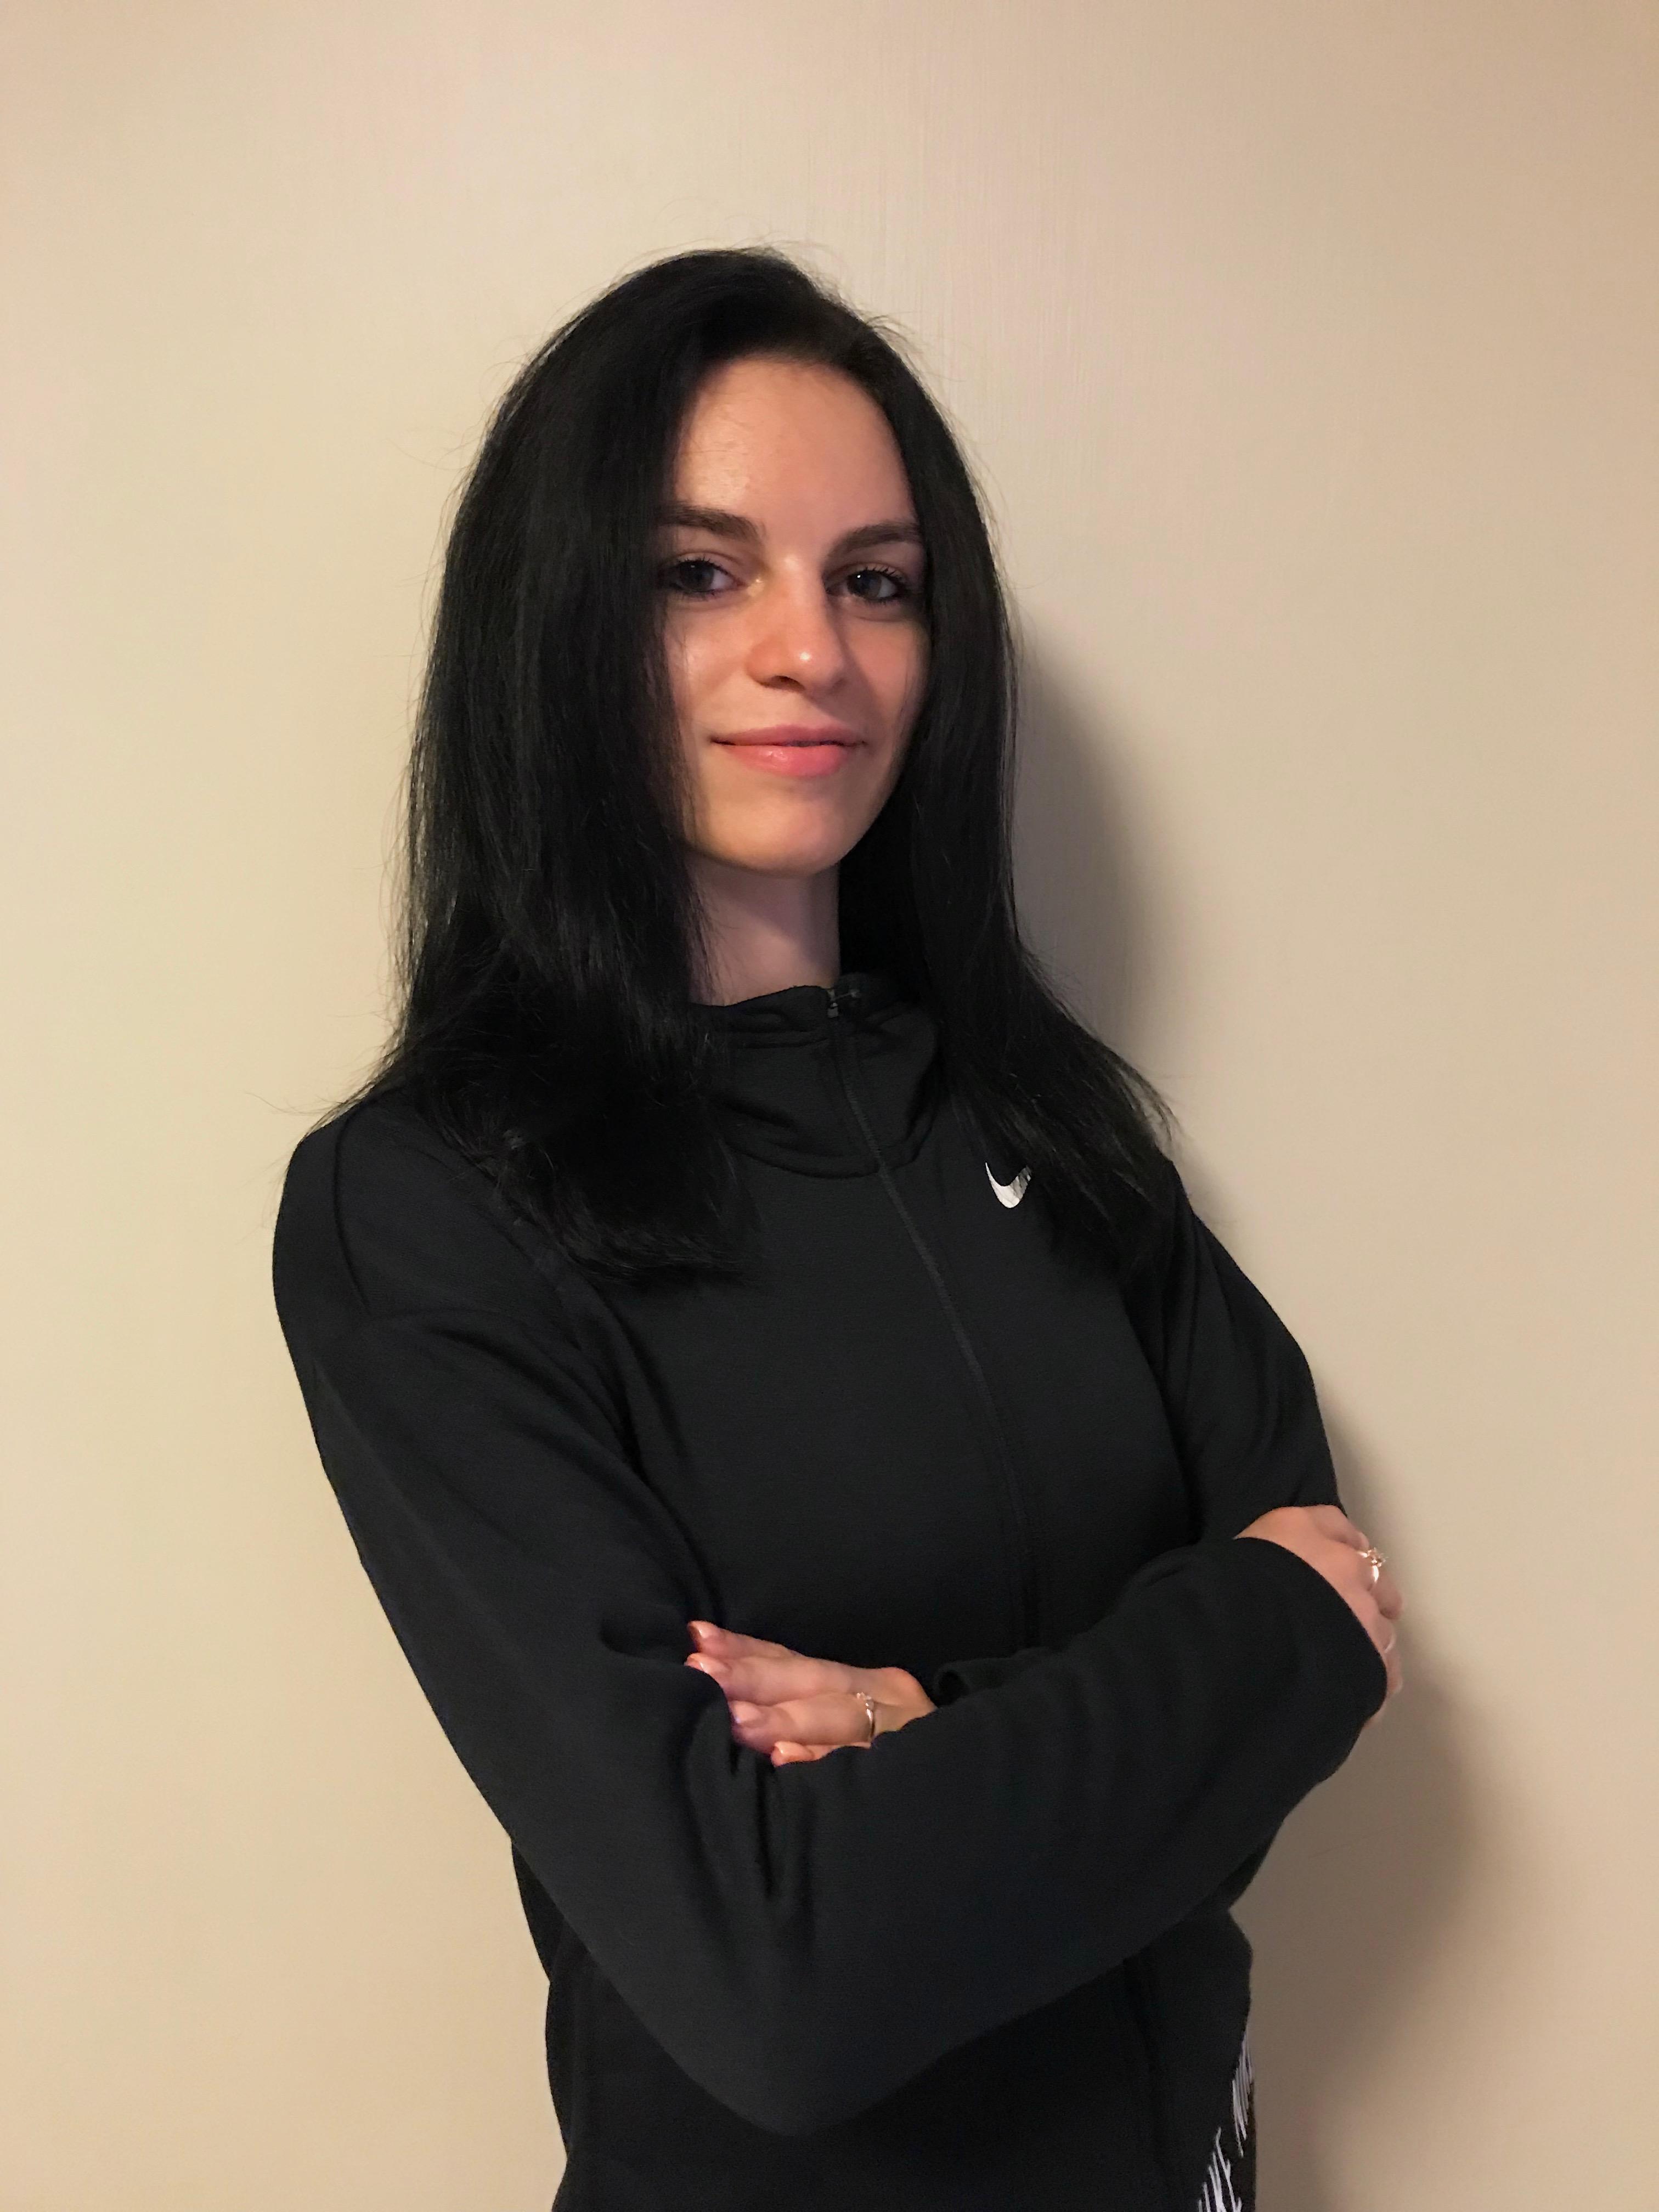 Тренер  Худ гимнастика Климова Нино